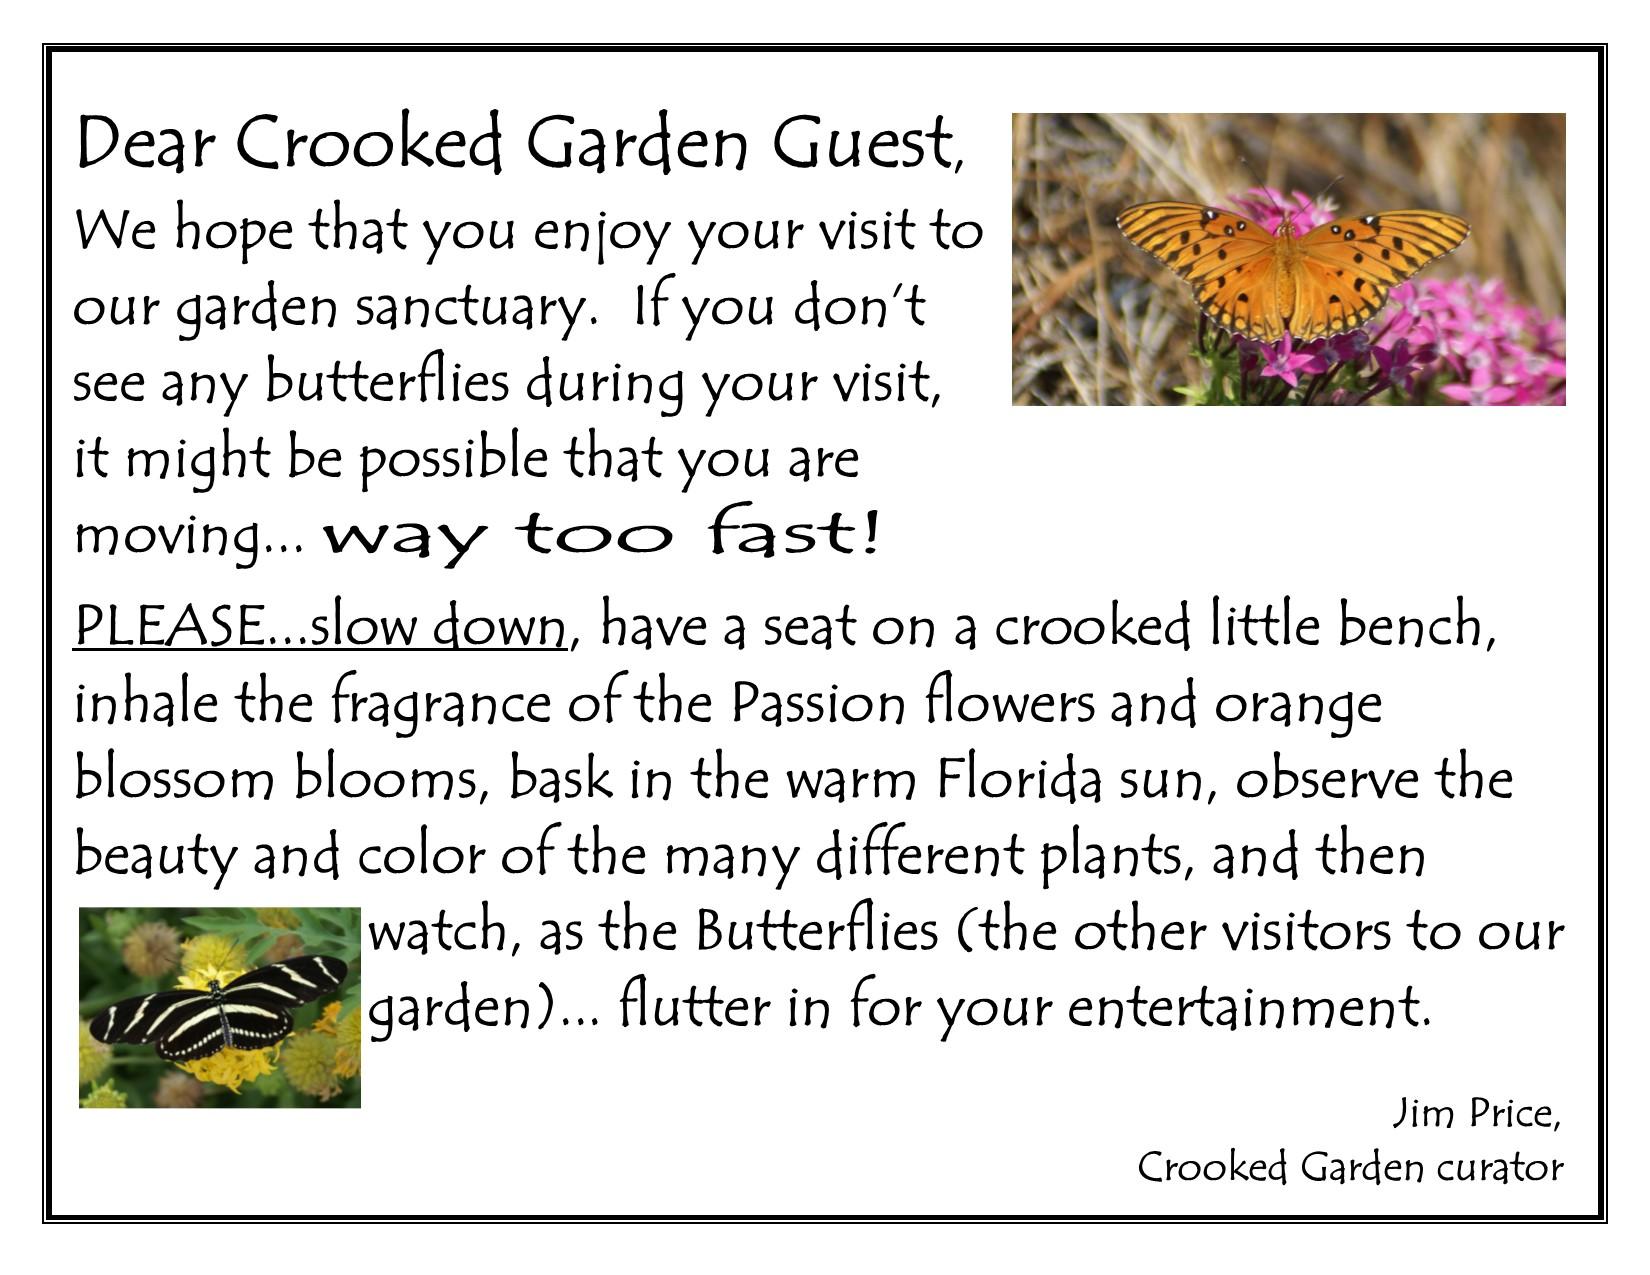 Dear crooked garden guests_11.26.11